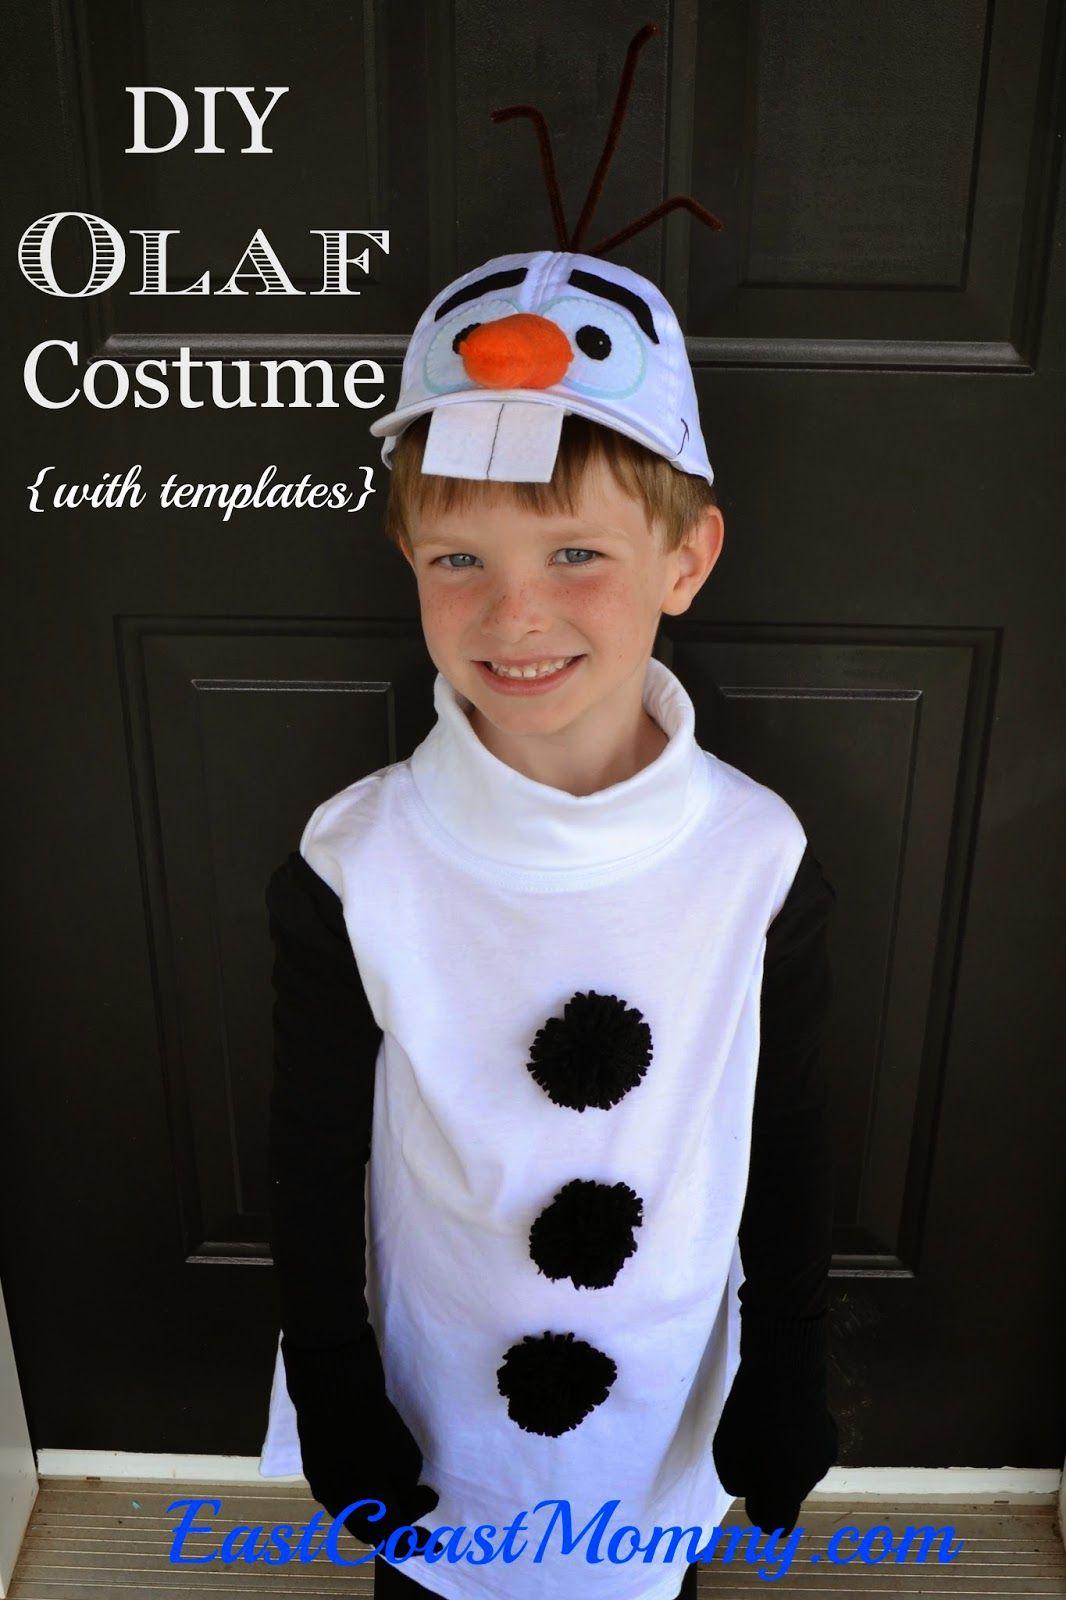 East Coast Mommy Diy Olaf Costume Full Tutorial And Free